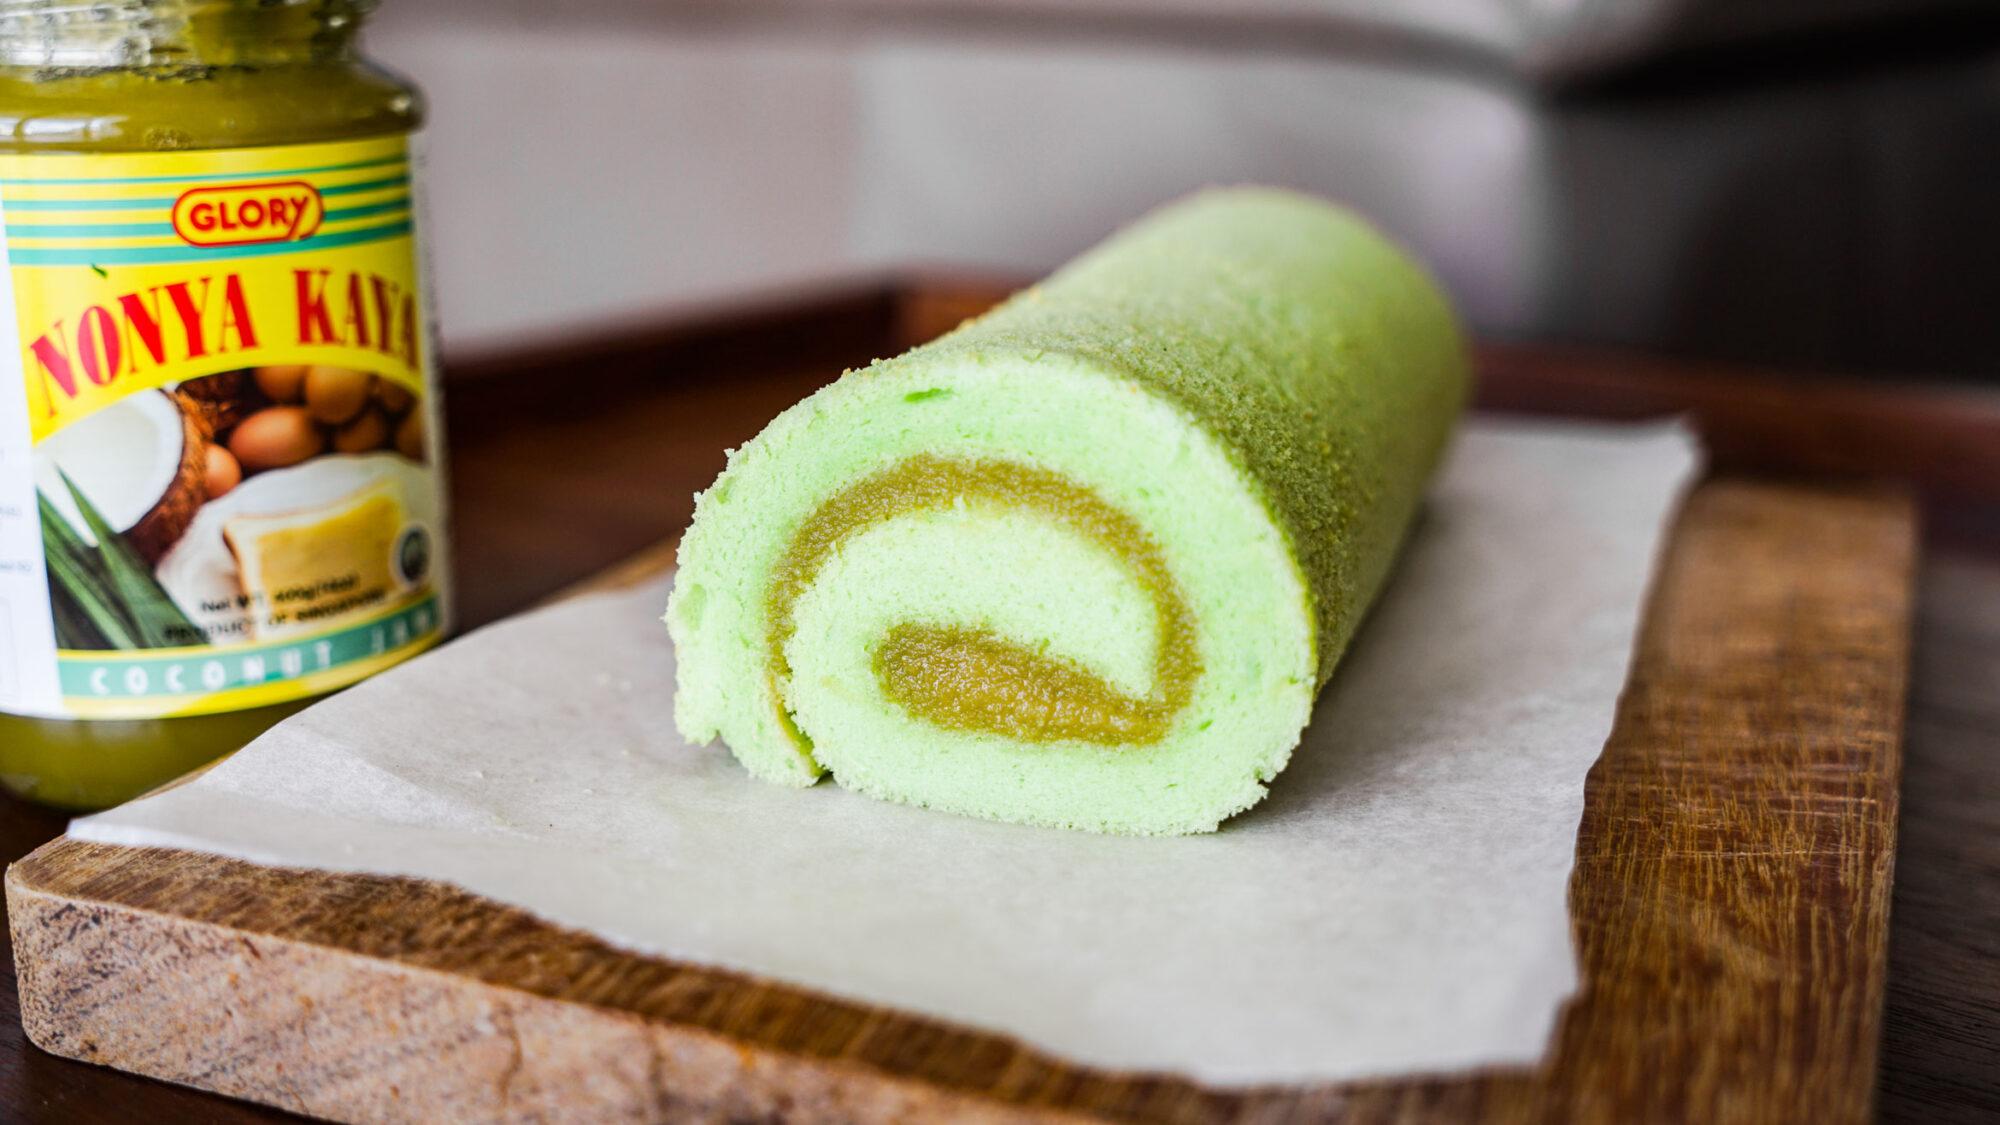 Article-Kaya-Jam-Jelly-Roll-Cake